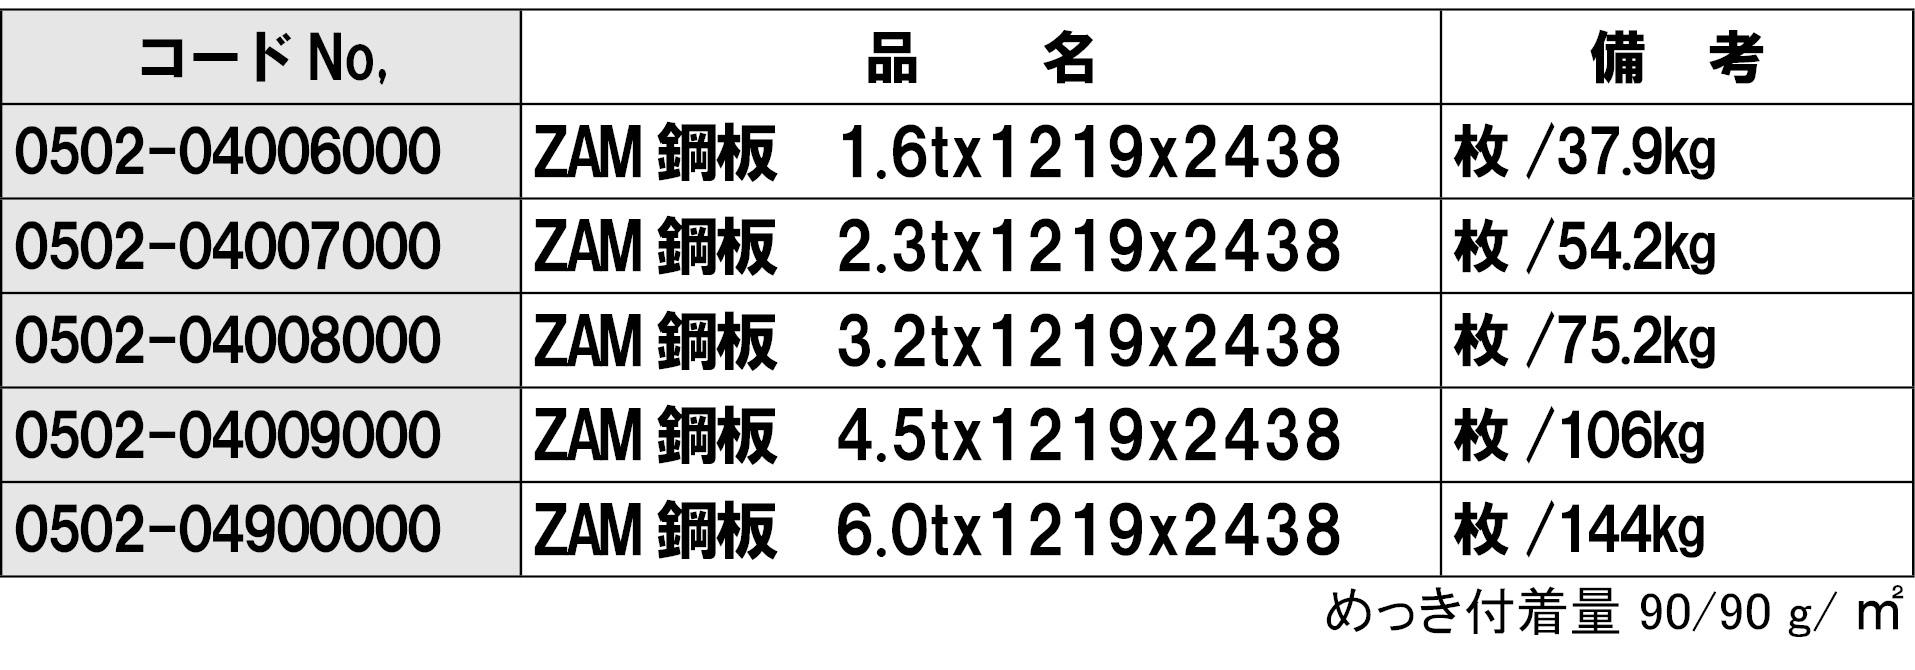 0502-04009000